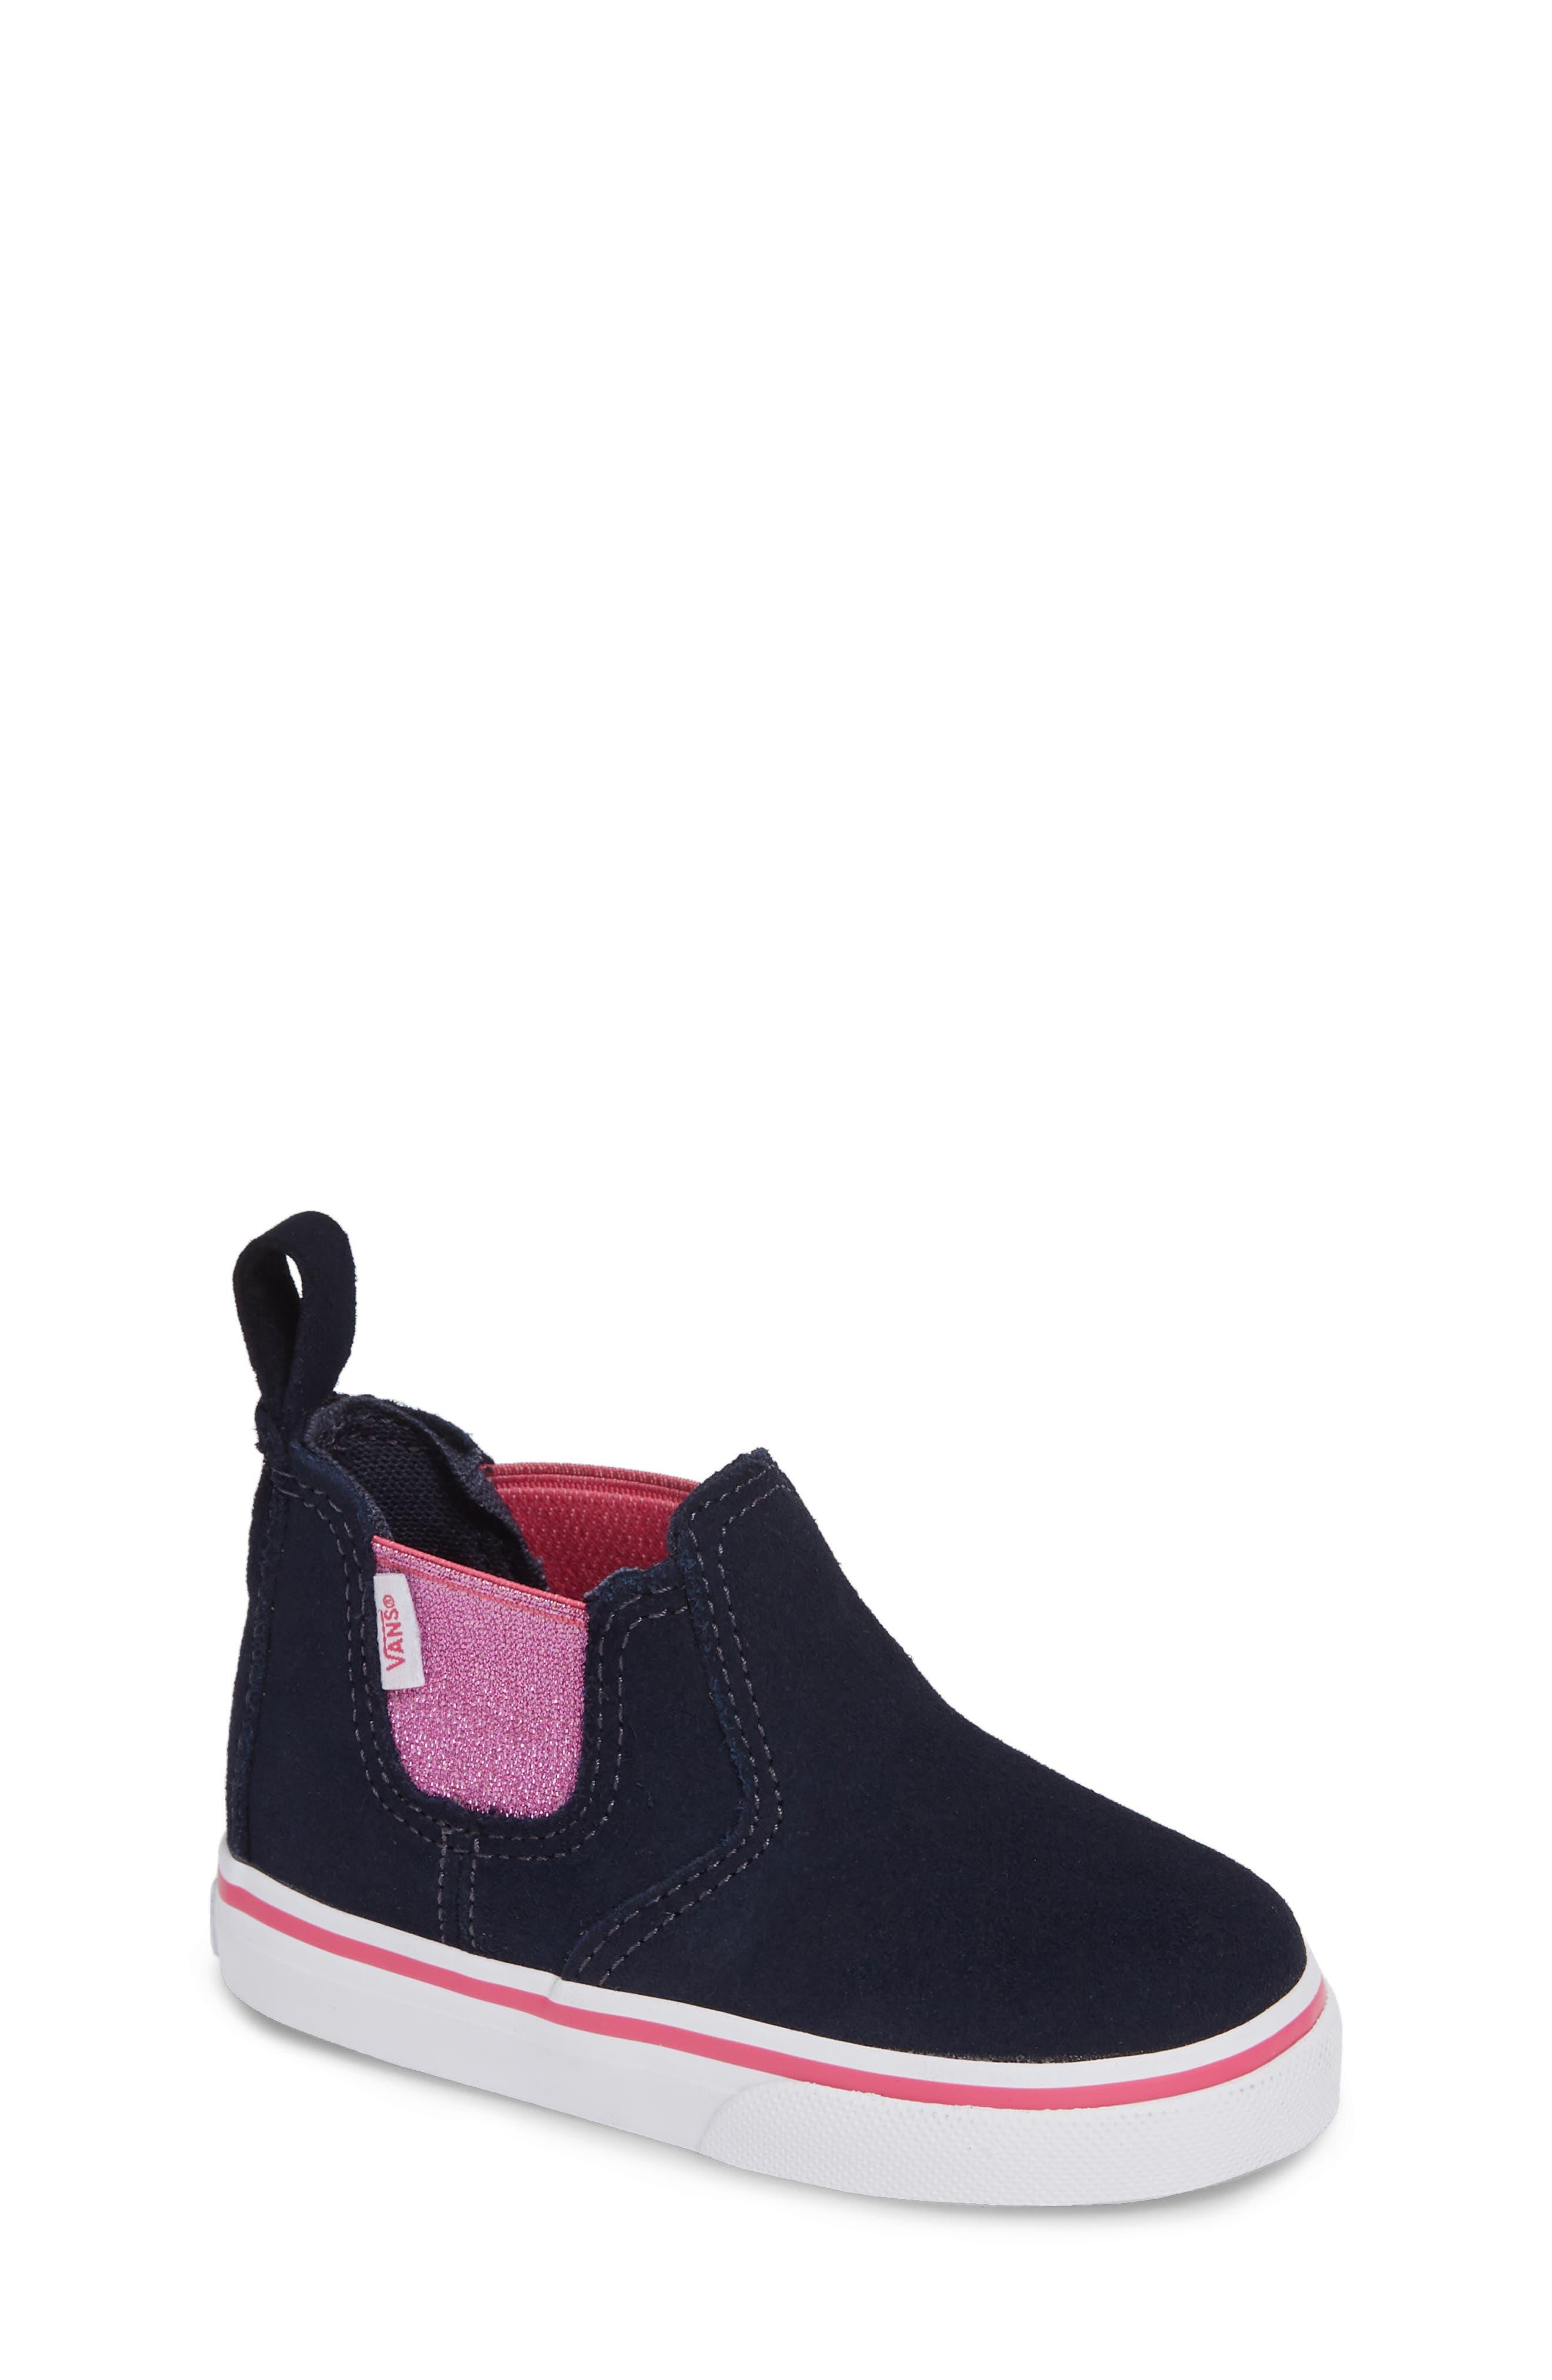 Classic Slip-On Sneaker,                             Main thumbnail 1, color,                             421